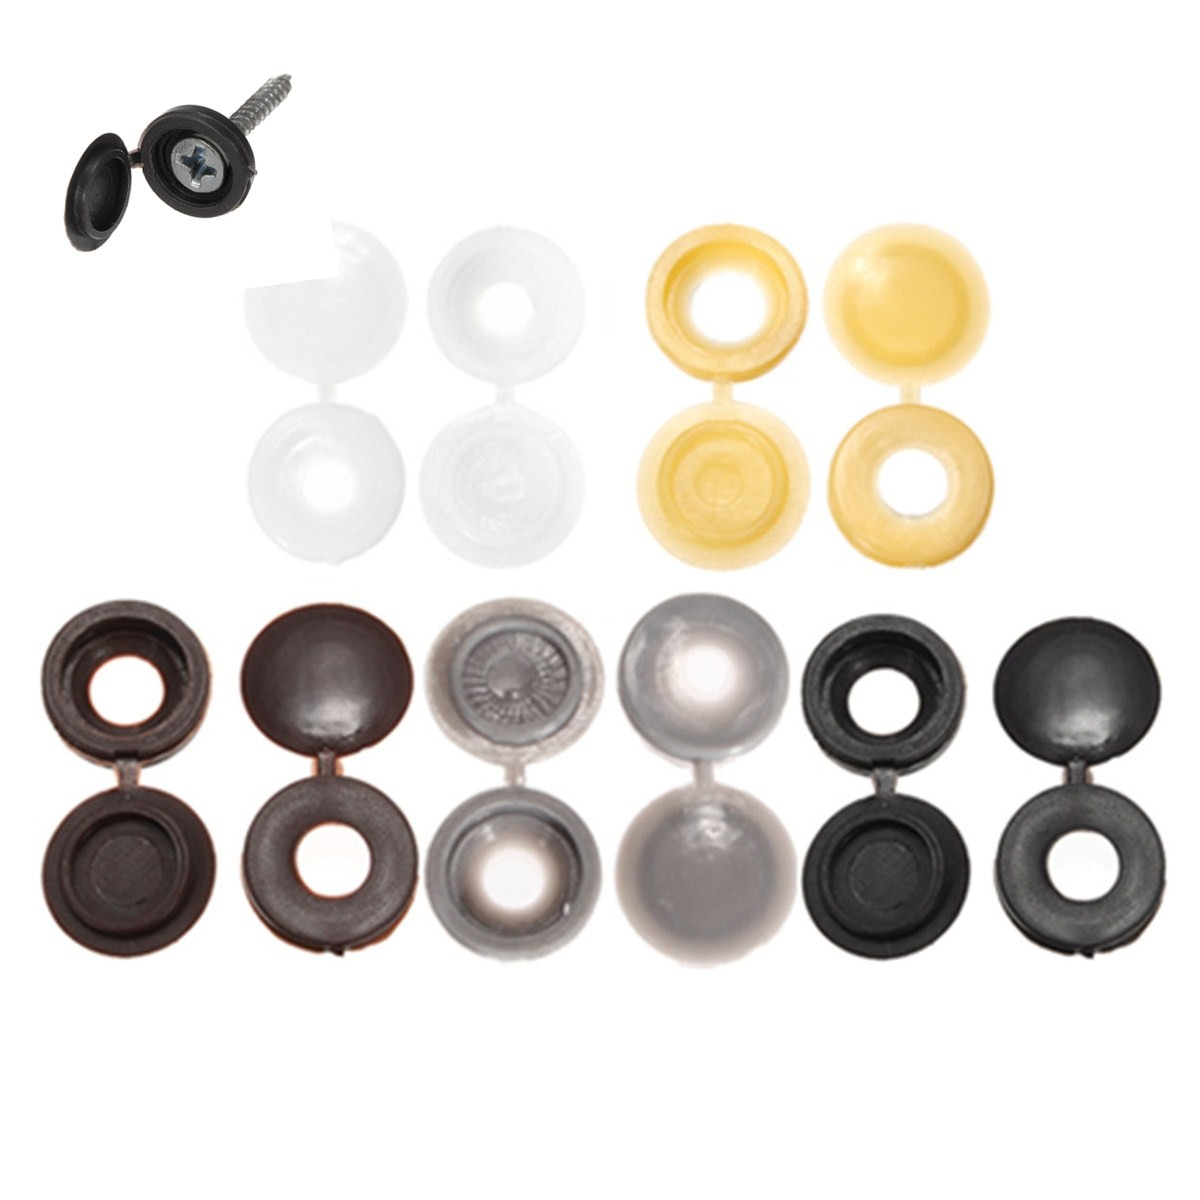 uxcell 50pcs Khaki Hinged Plastic Clips Screw Fold Caps Cover 4mm for Auto Car Decor